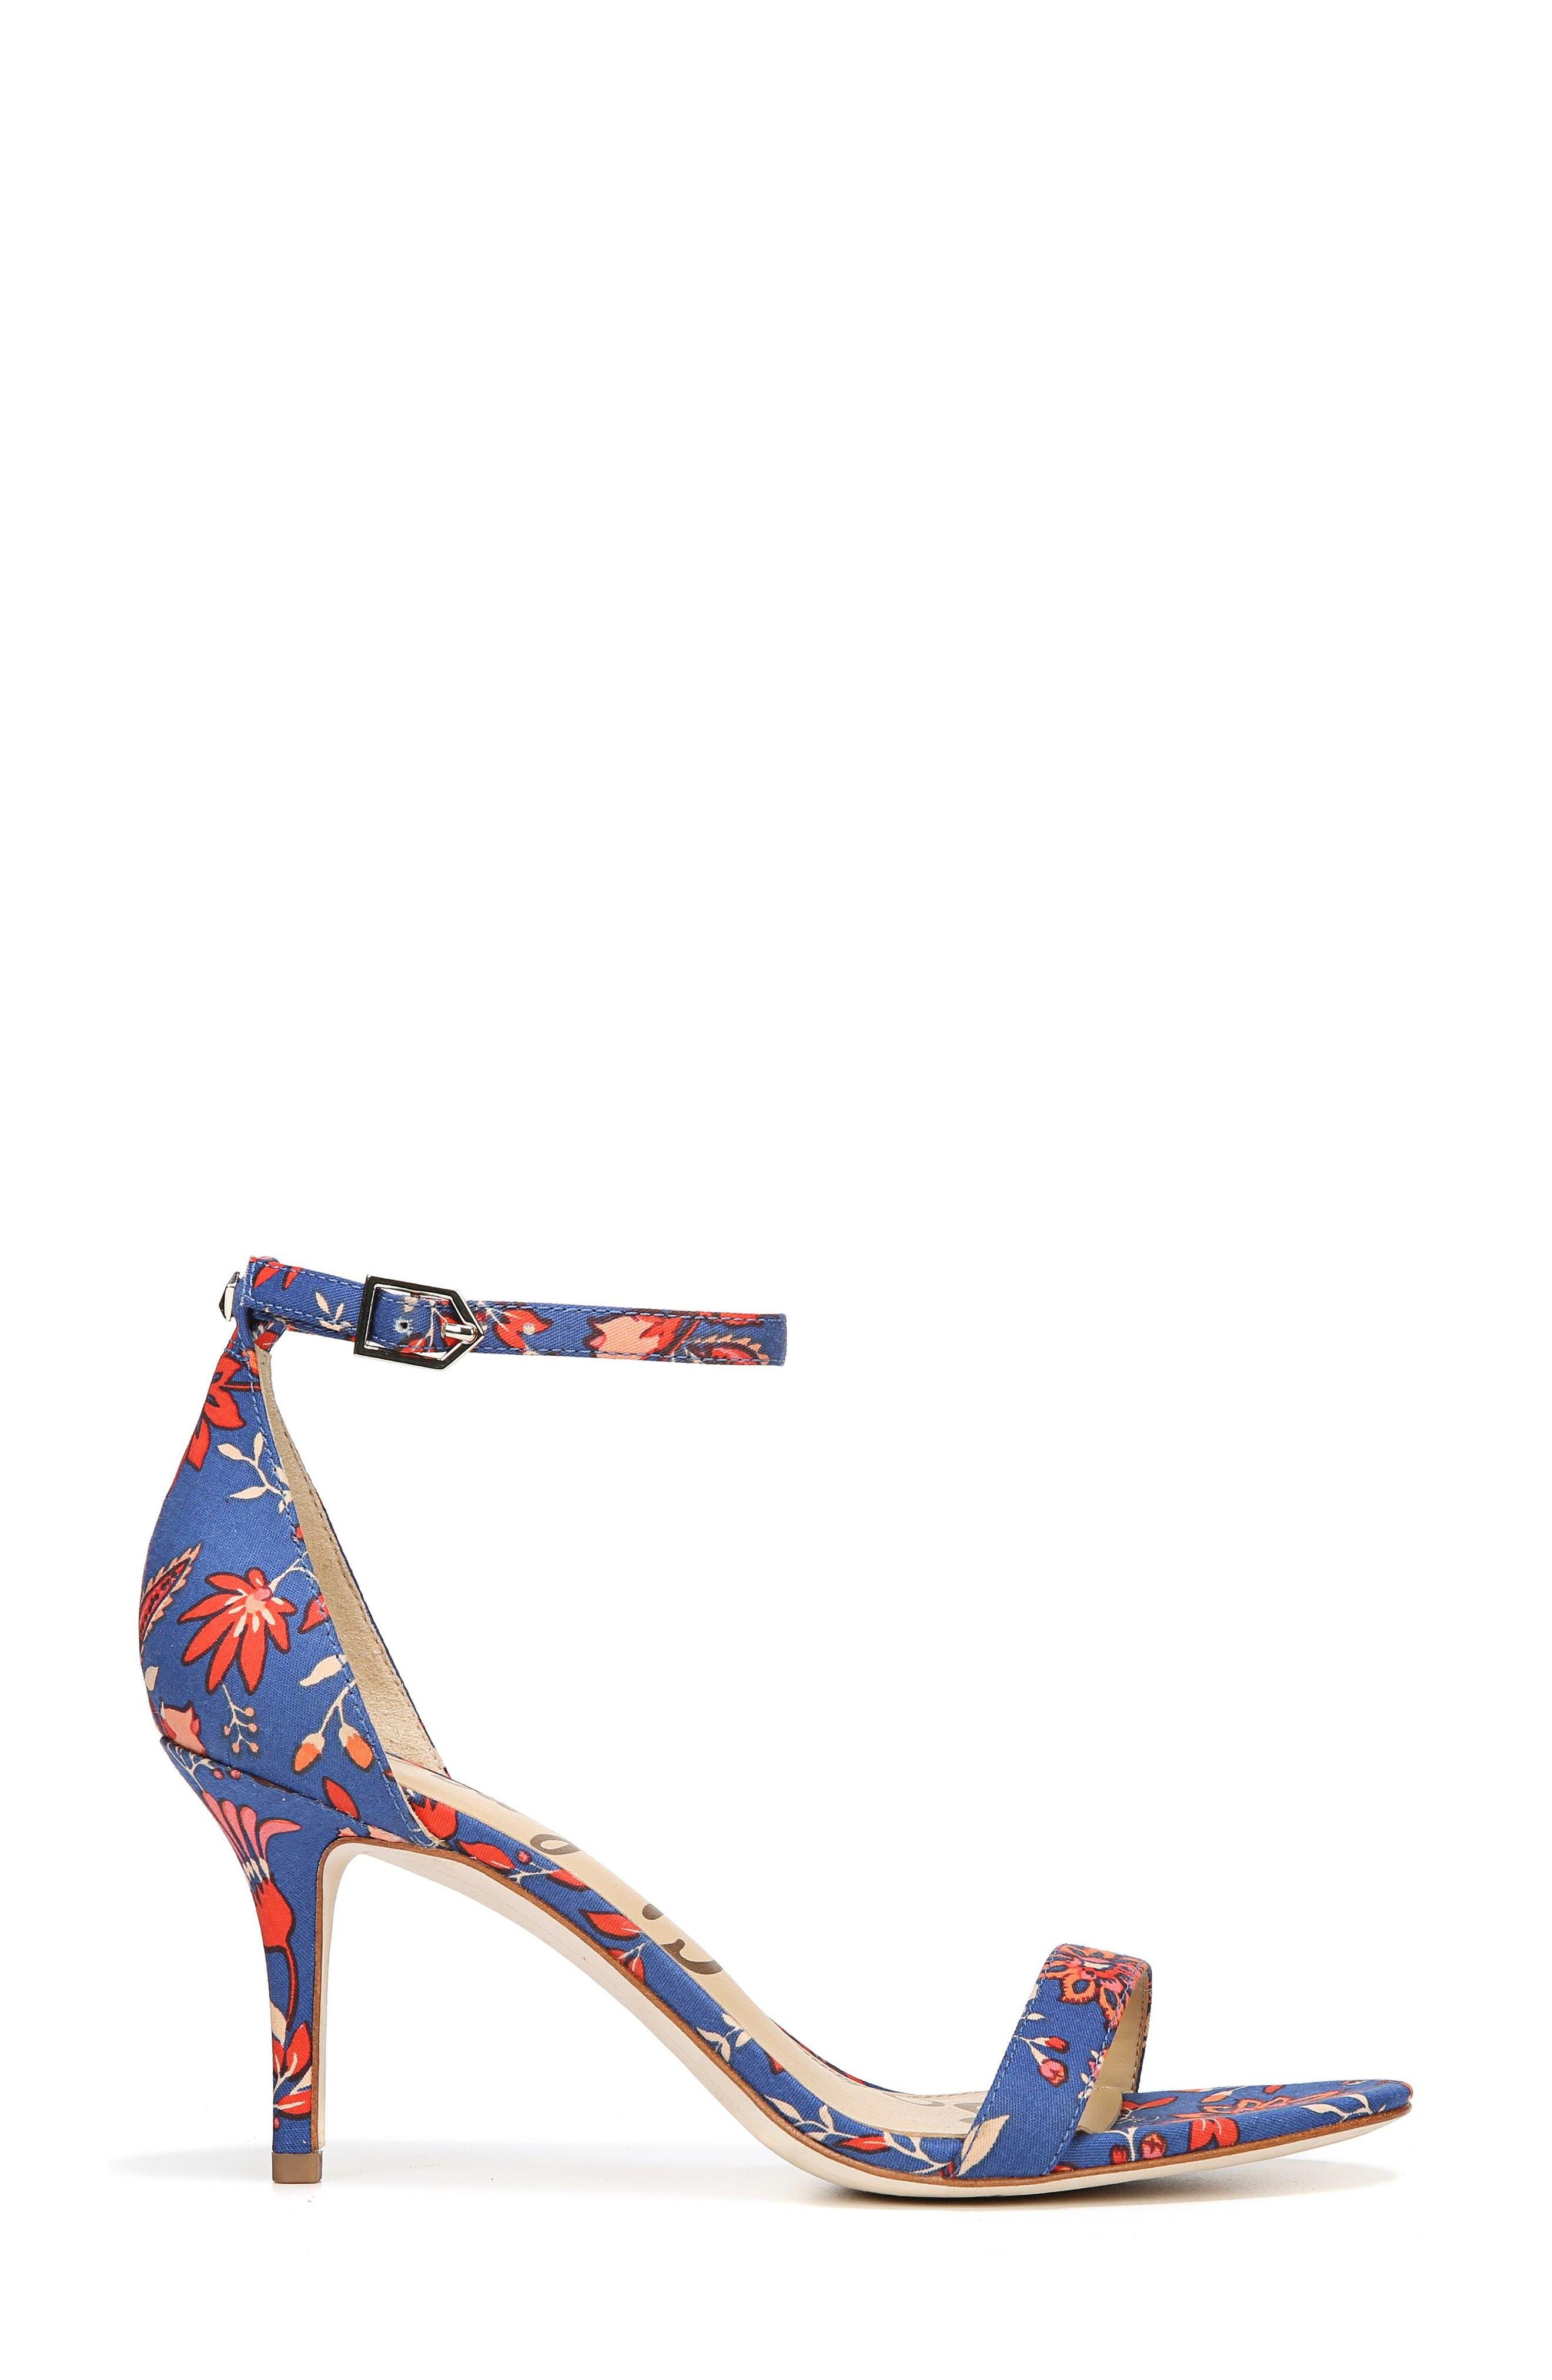 ,                             'Patti' Ankle Strap Sandal,                             Alternate thumbnail 104, color,                             405